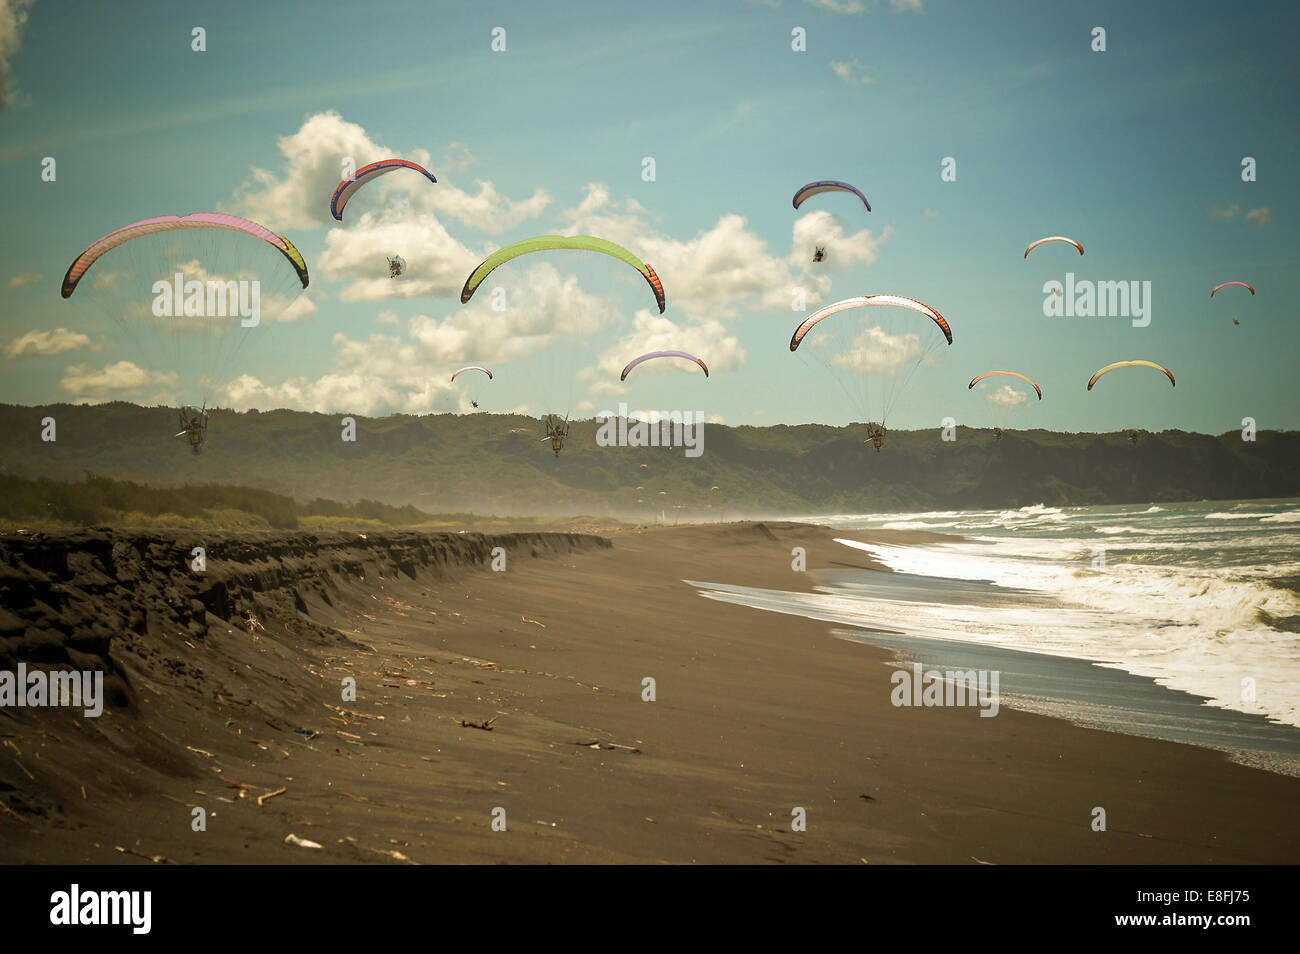 Indonesia, Yogyakarta Region, Jogja, Paragliding above Parang Tritis Beach - Stock Image